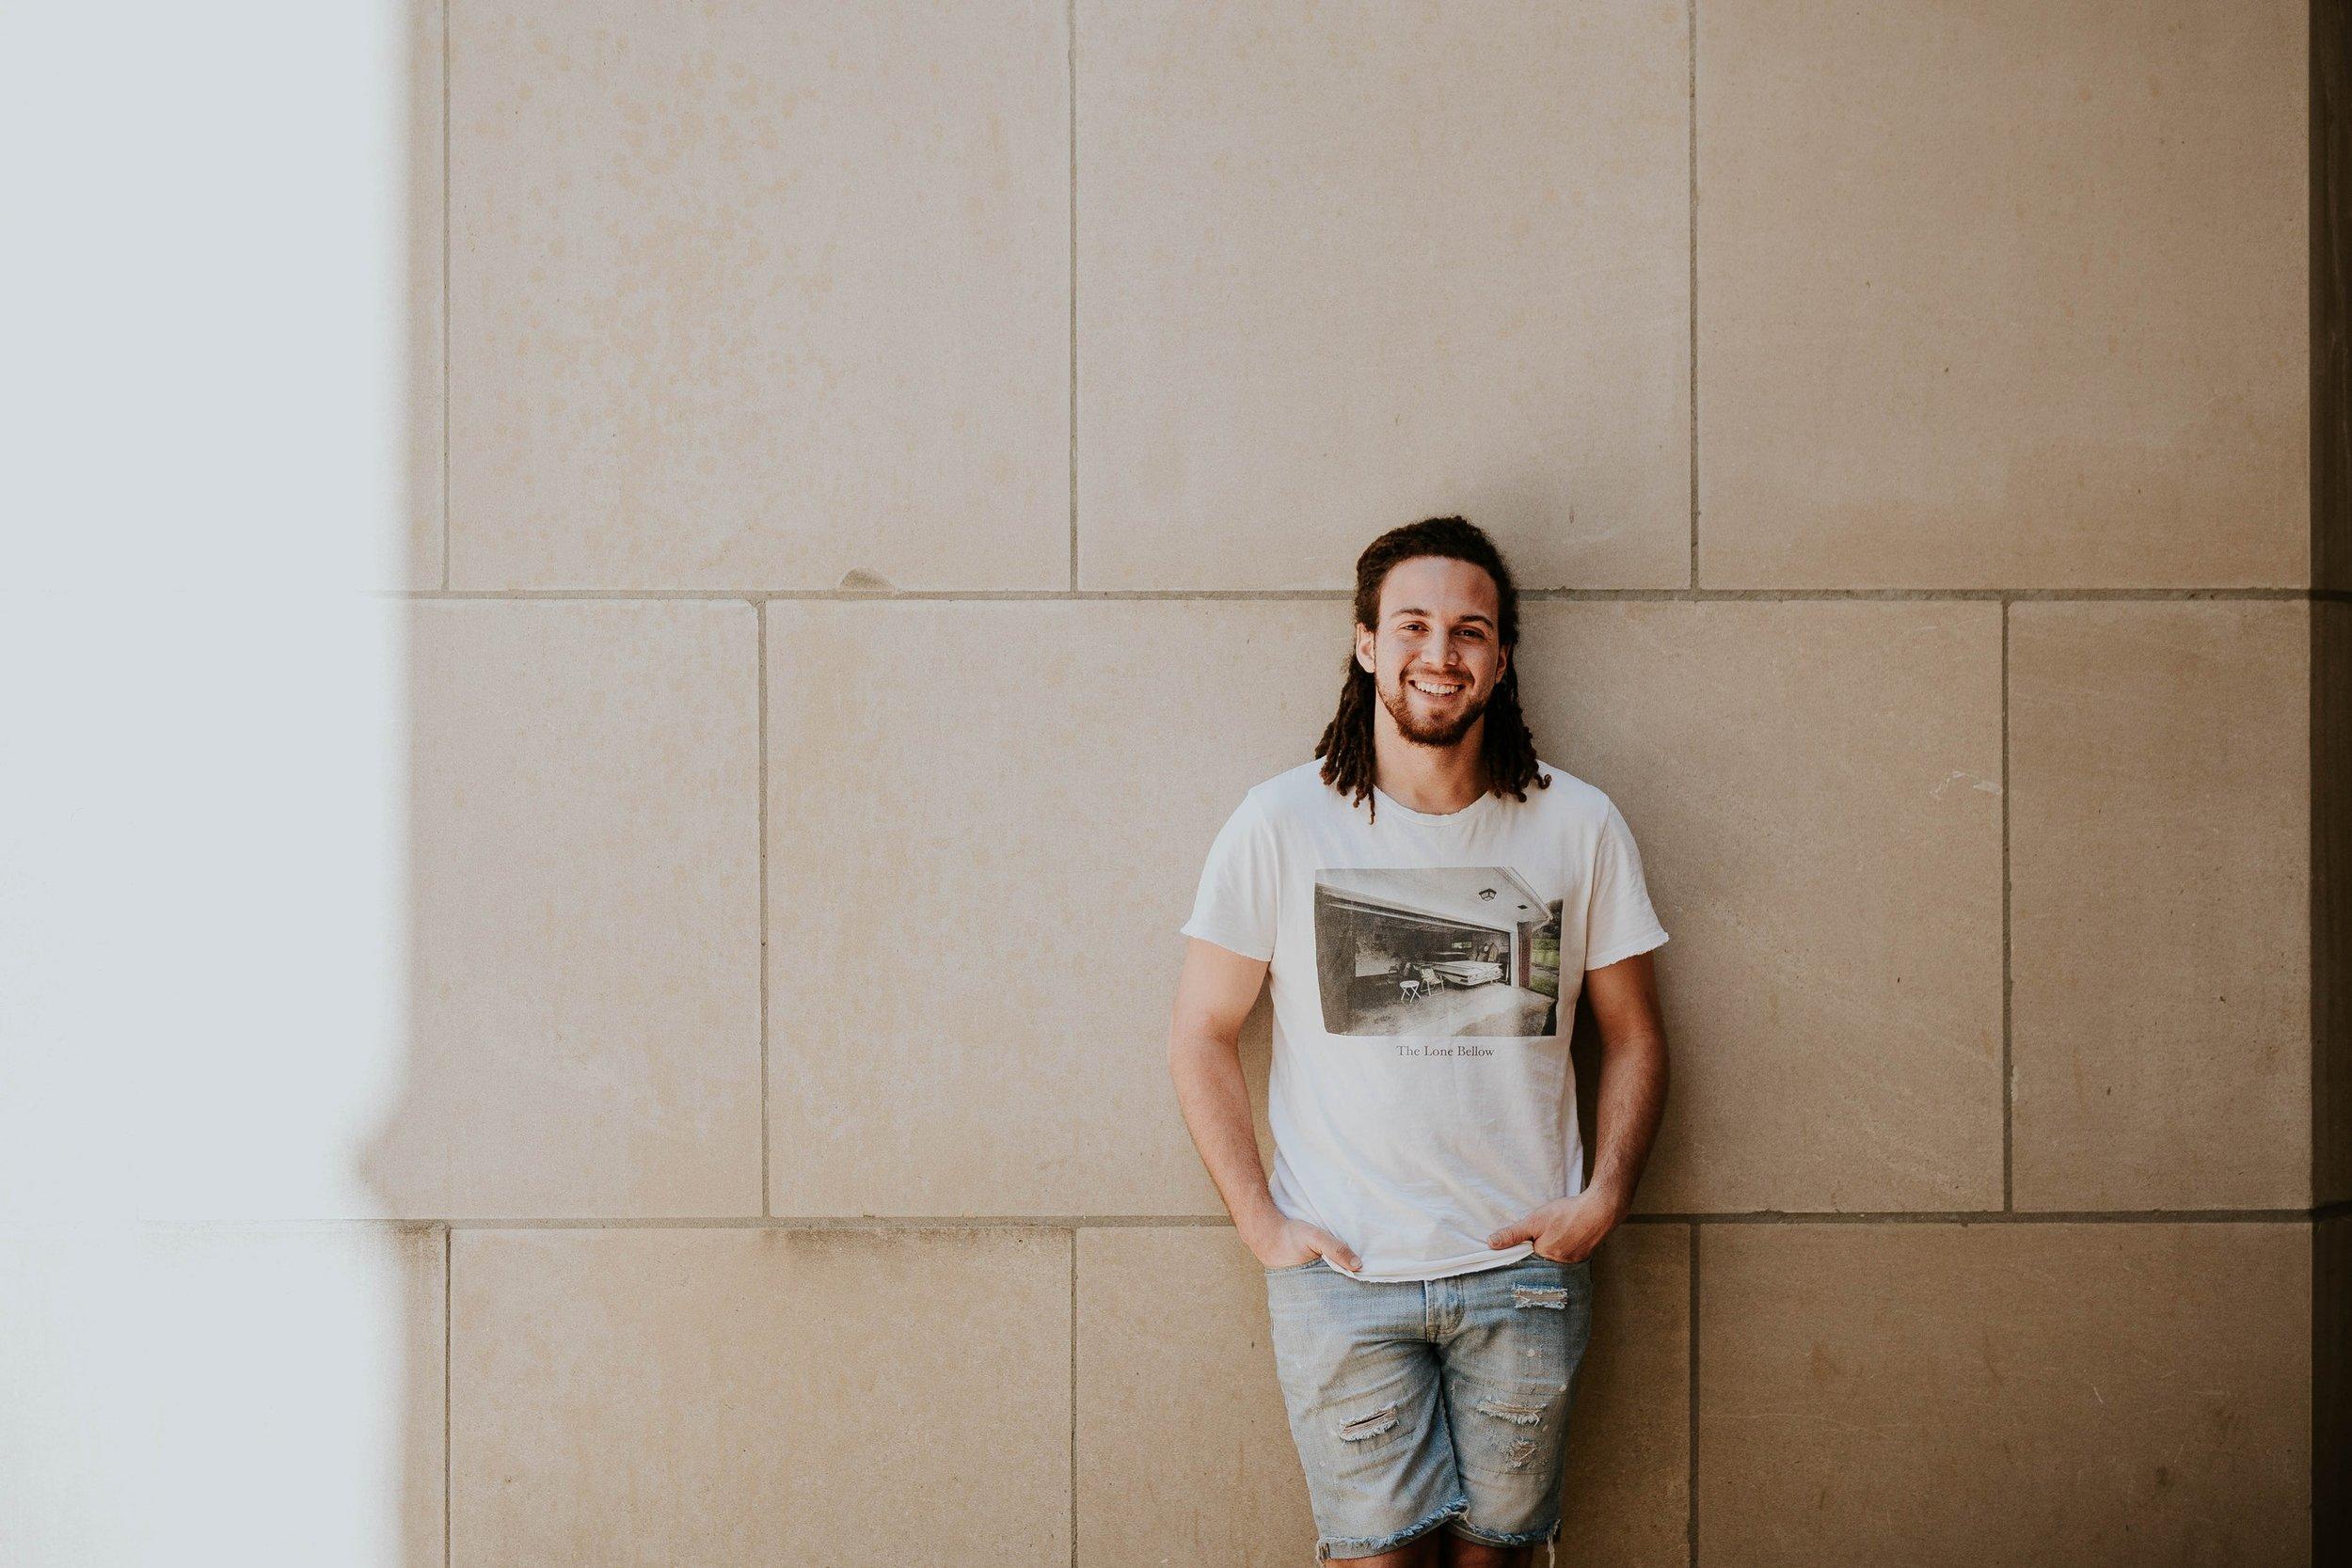 man against wall smiling.jpg